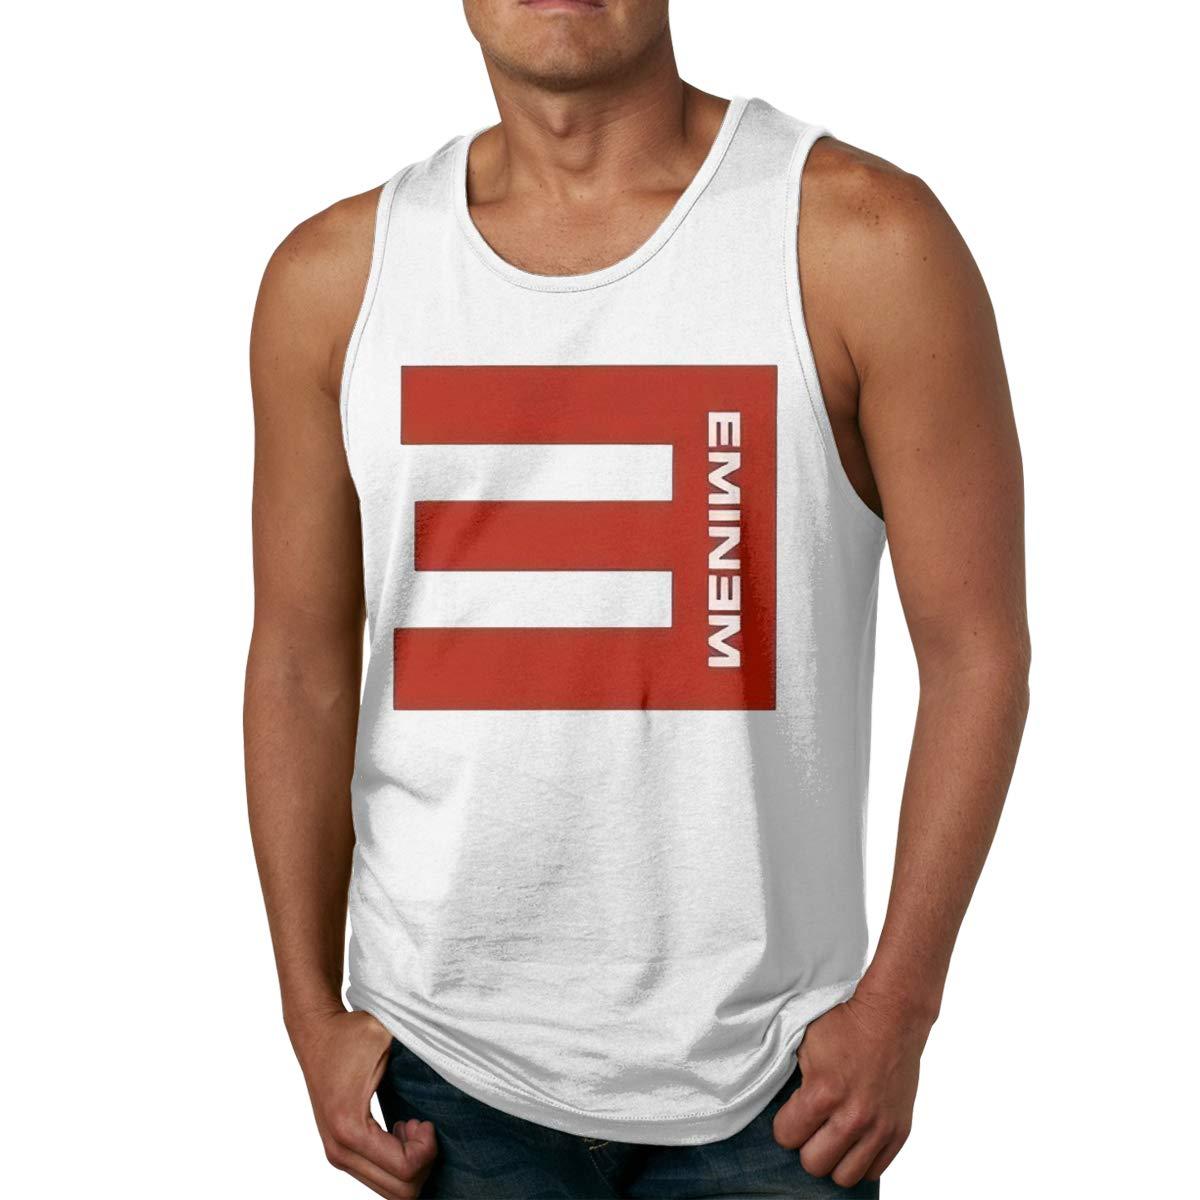 Dabson Eminem Red Logo S Tank Top Shirt